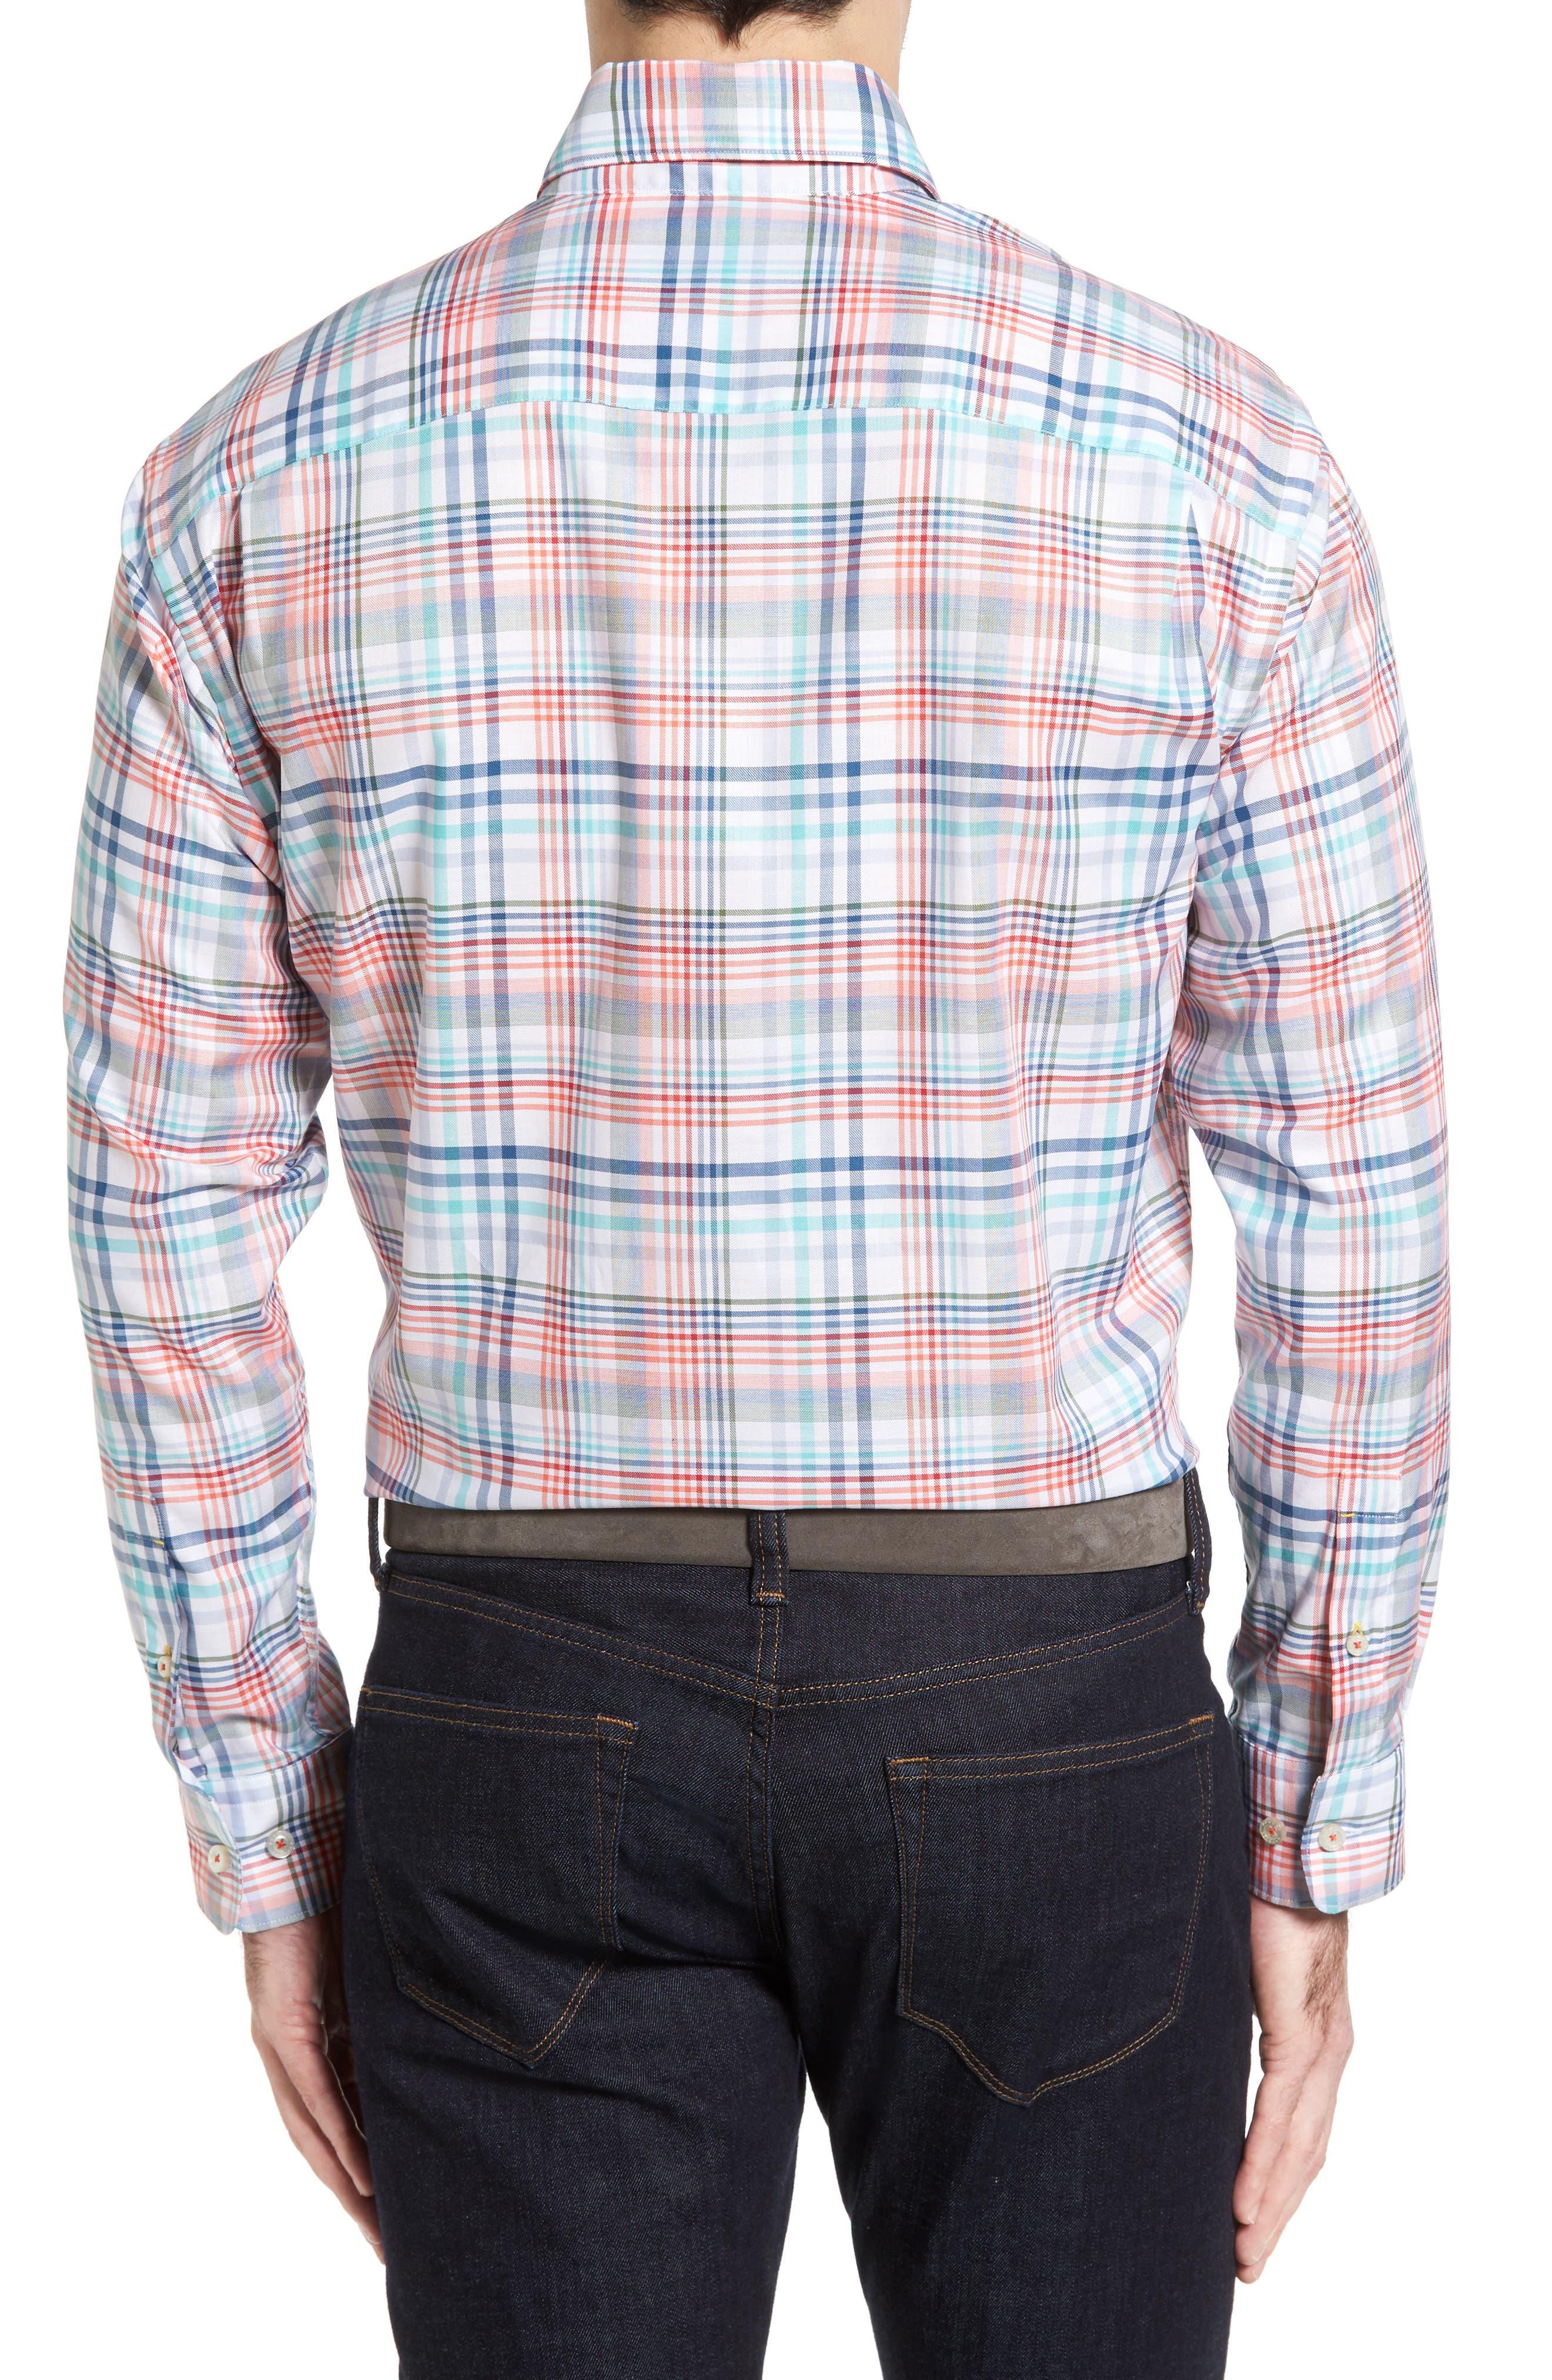 ROBERT TALBOTT,                             Anderson Classic Fit Plaid Twill Sport Shirt,                             Alternate thumbnail 2, color,                             860